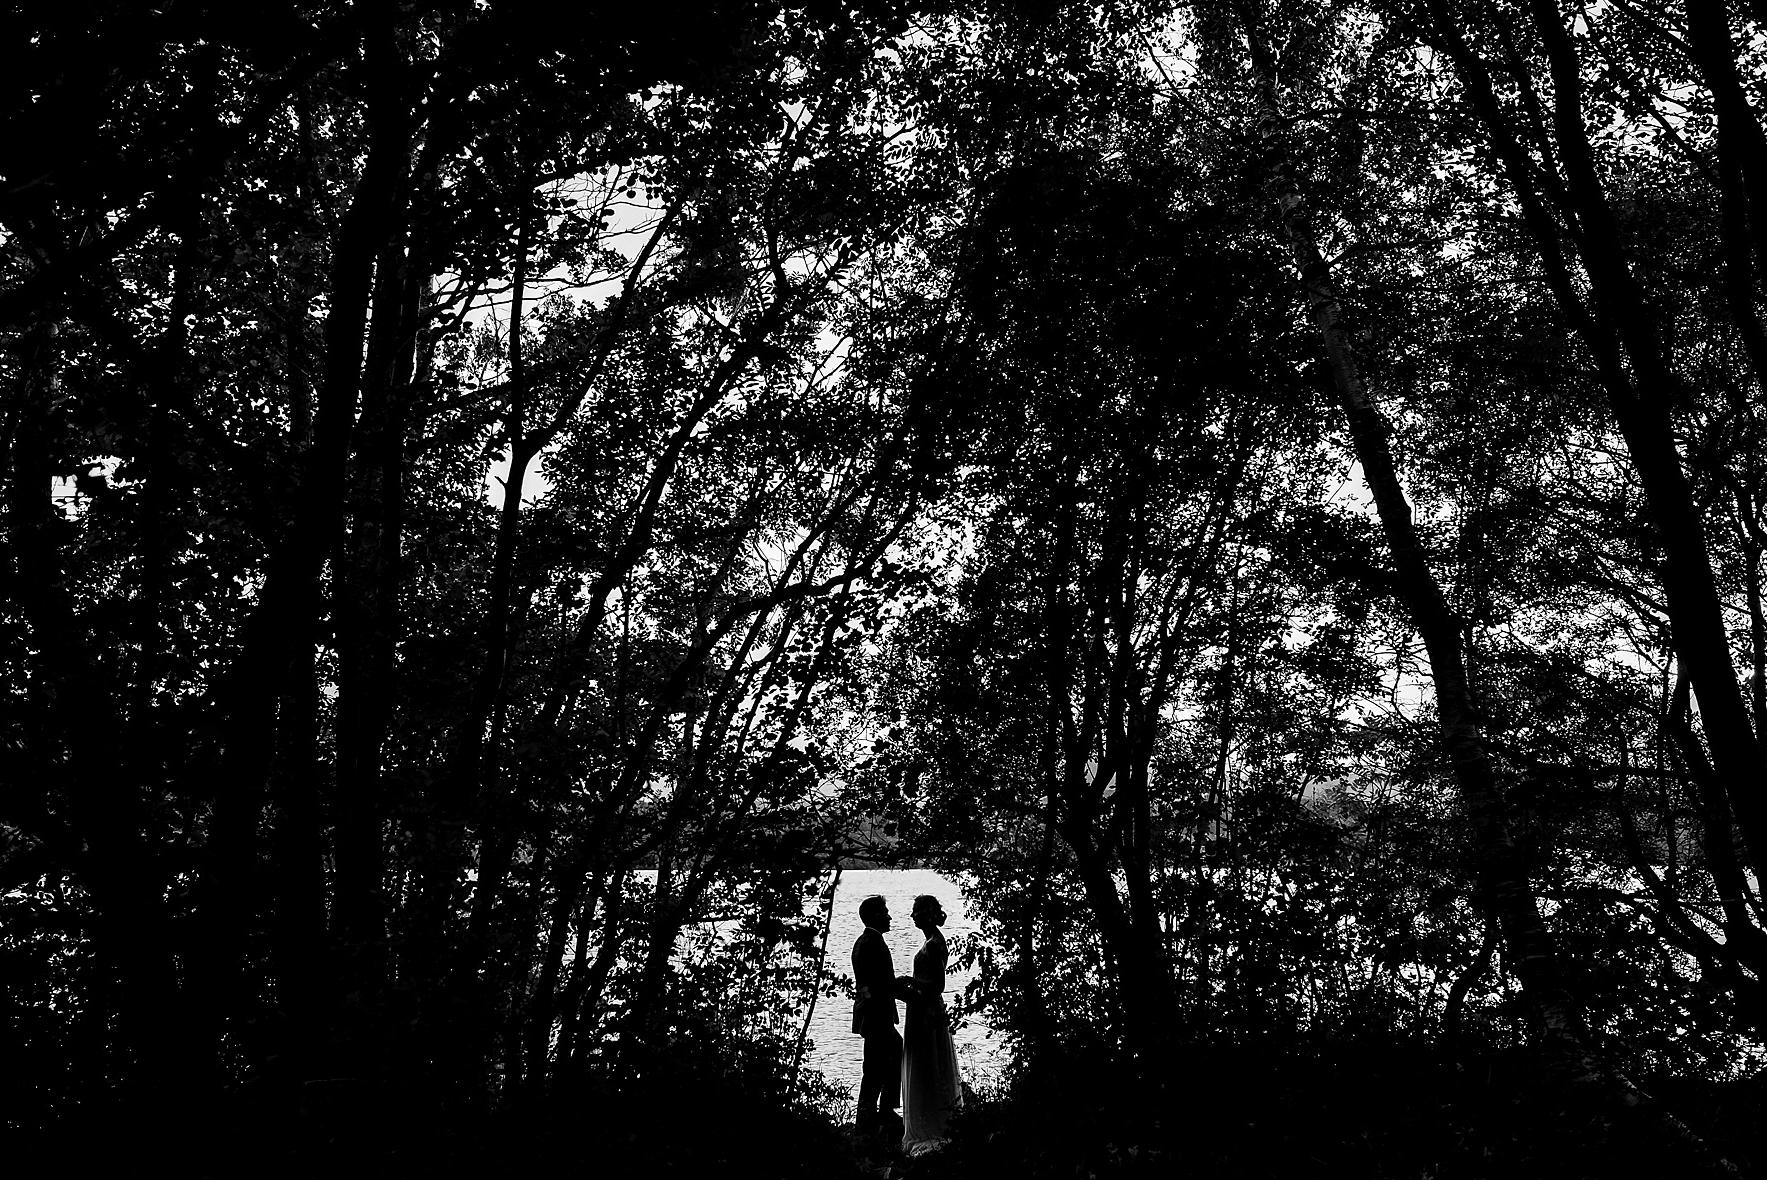 Dan-Wootton-Photography - 04.jpg